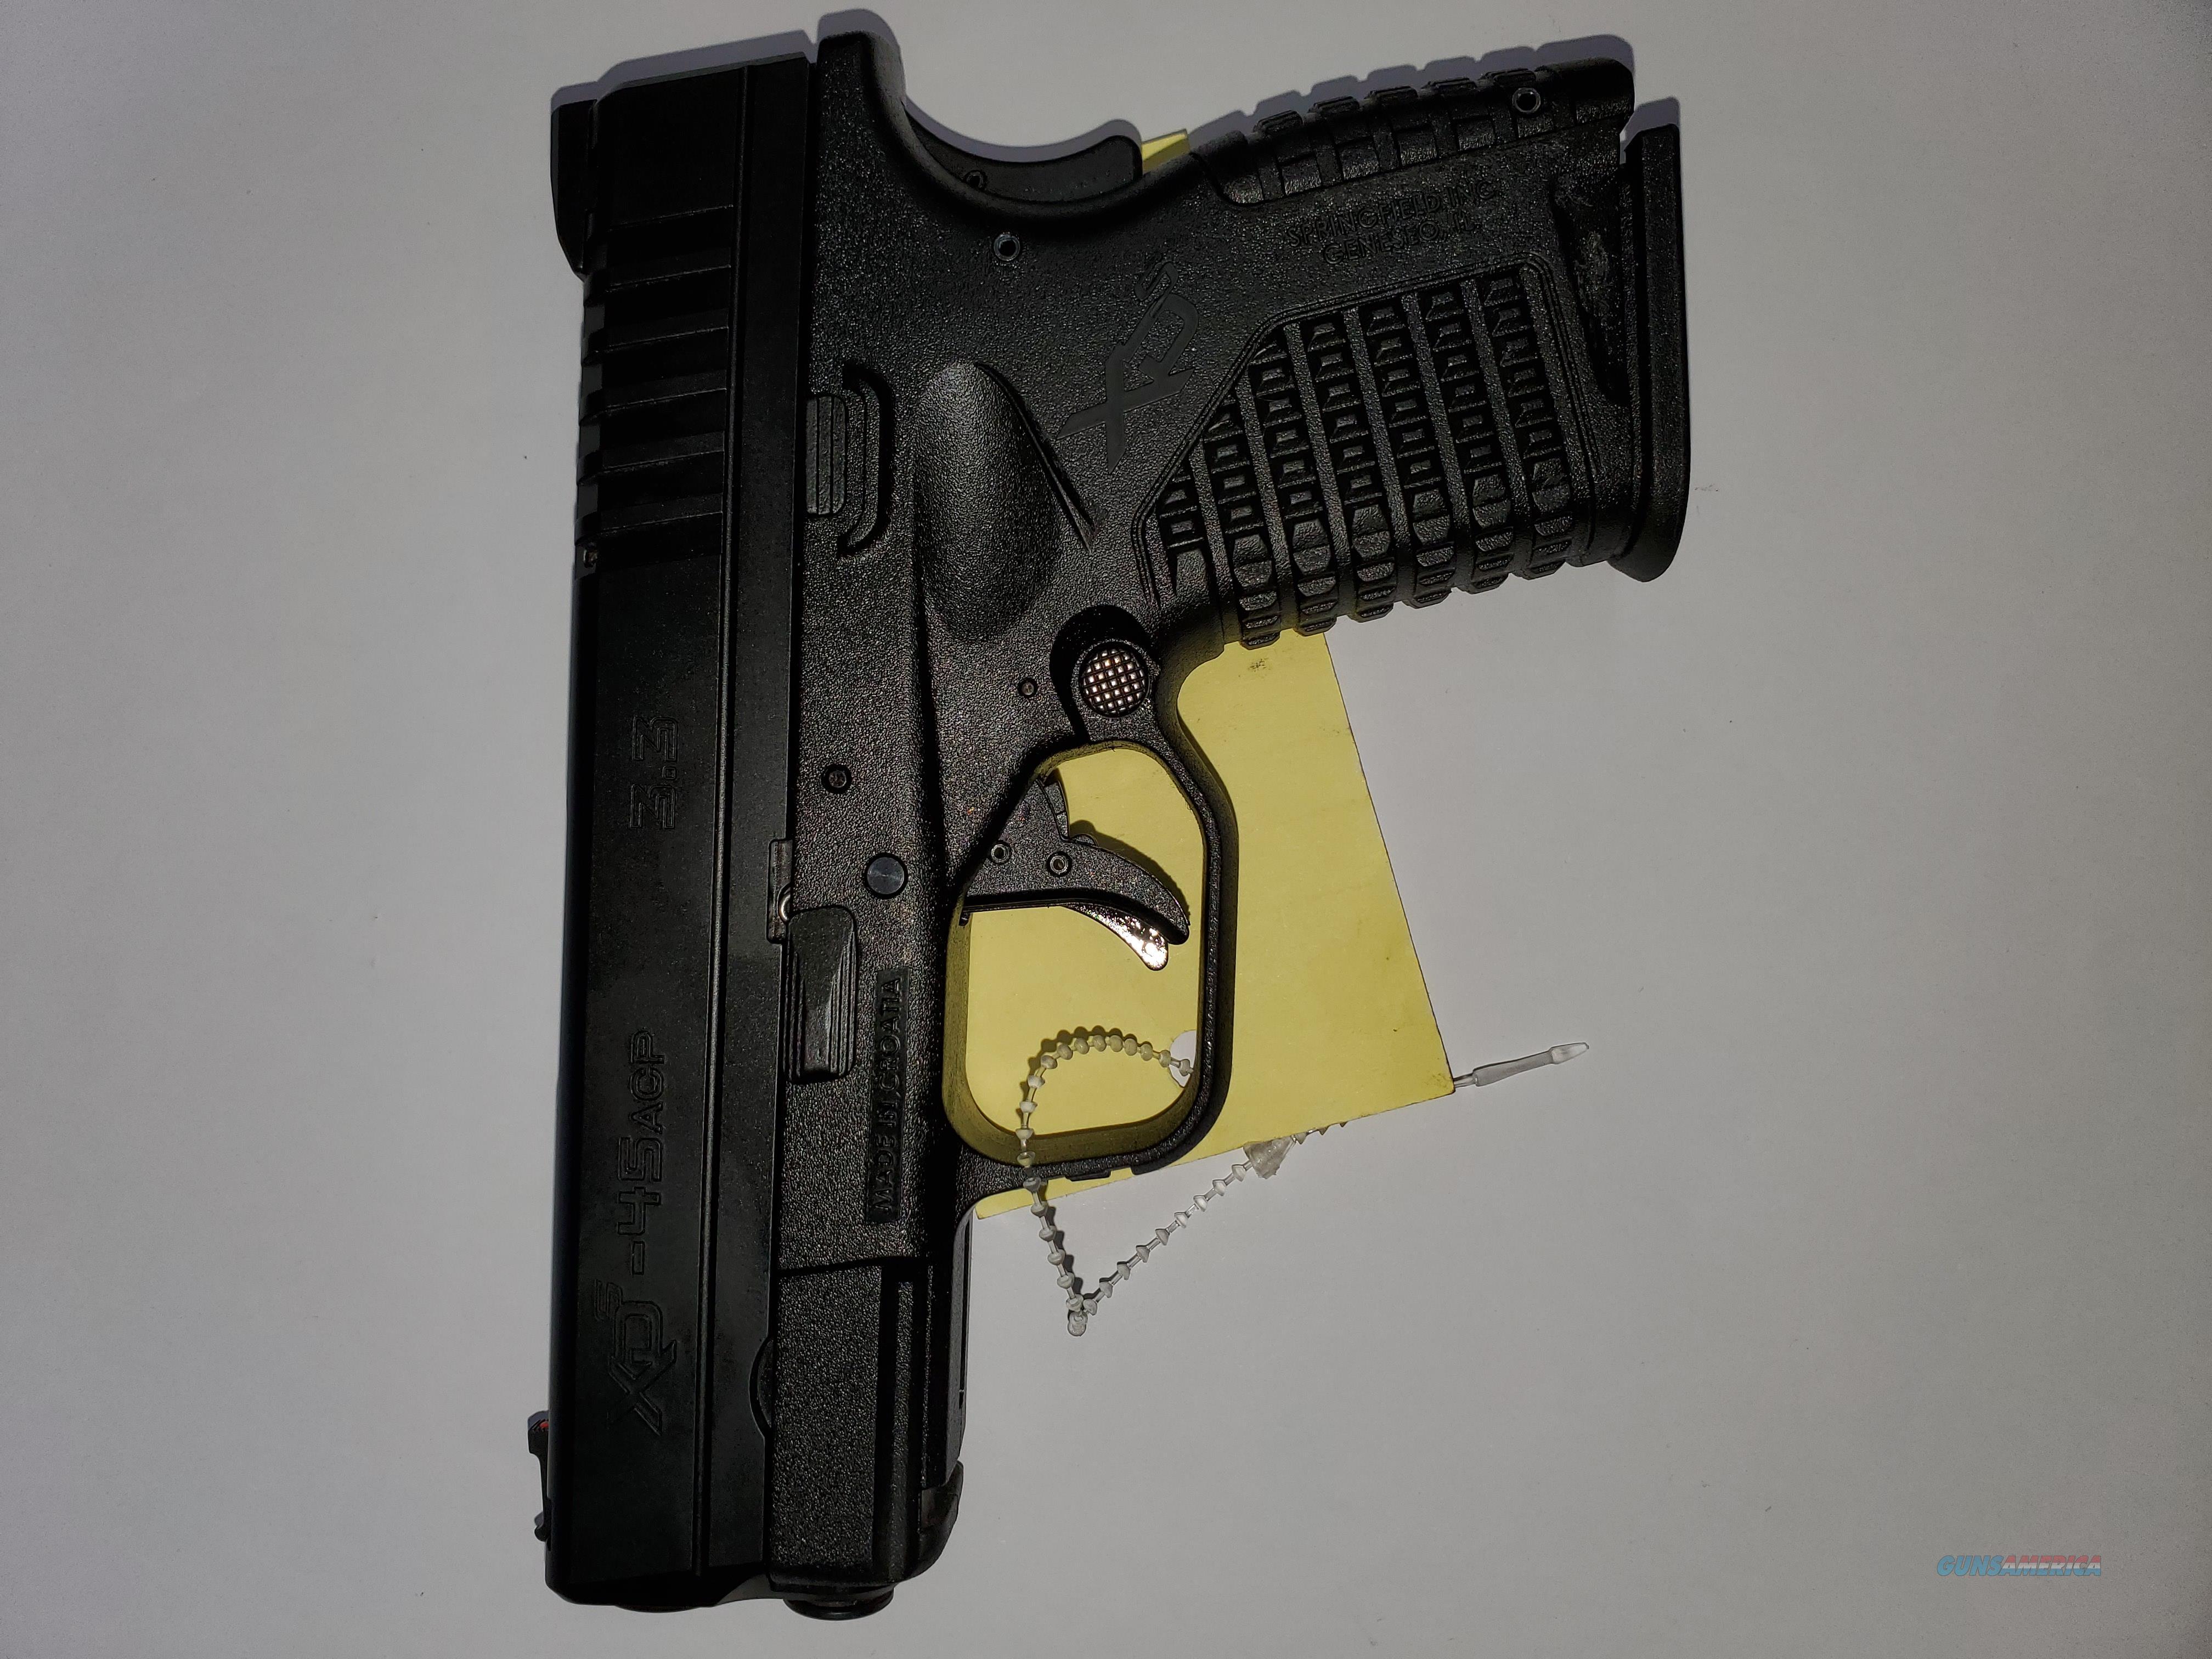 Springfield xds-45  Guns > Pistols > Springfield Armory Pistols > XD-S